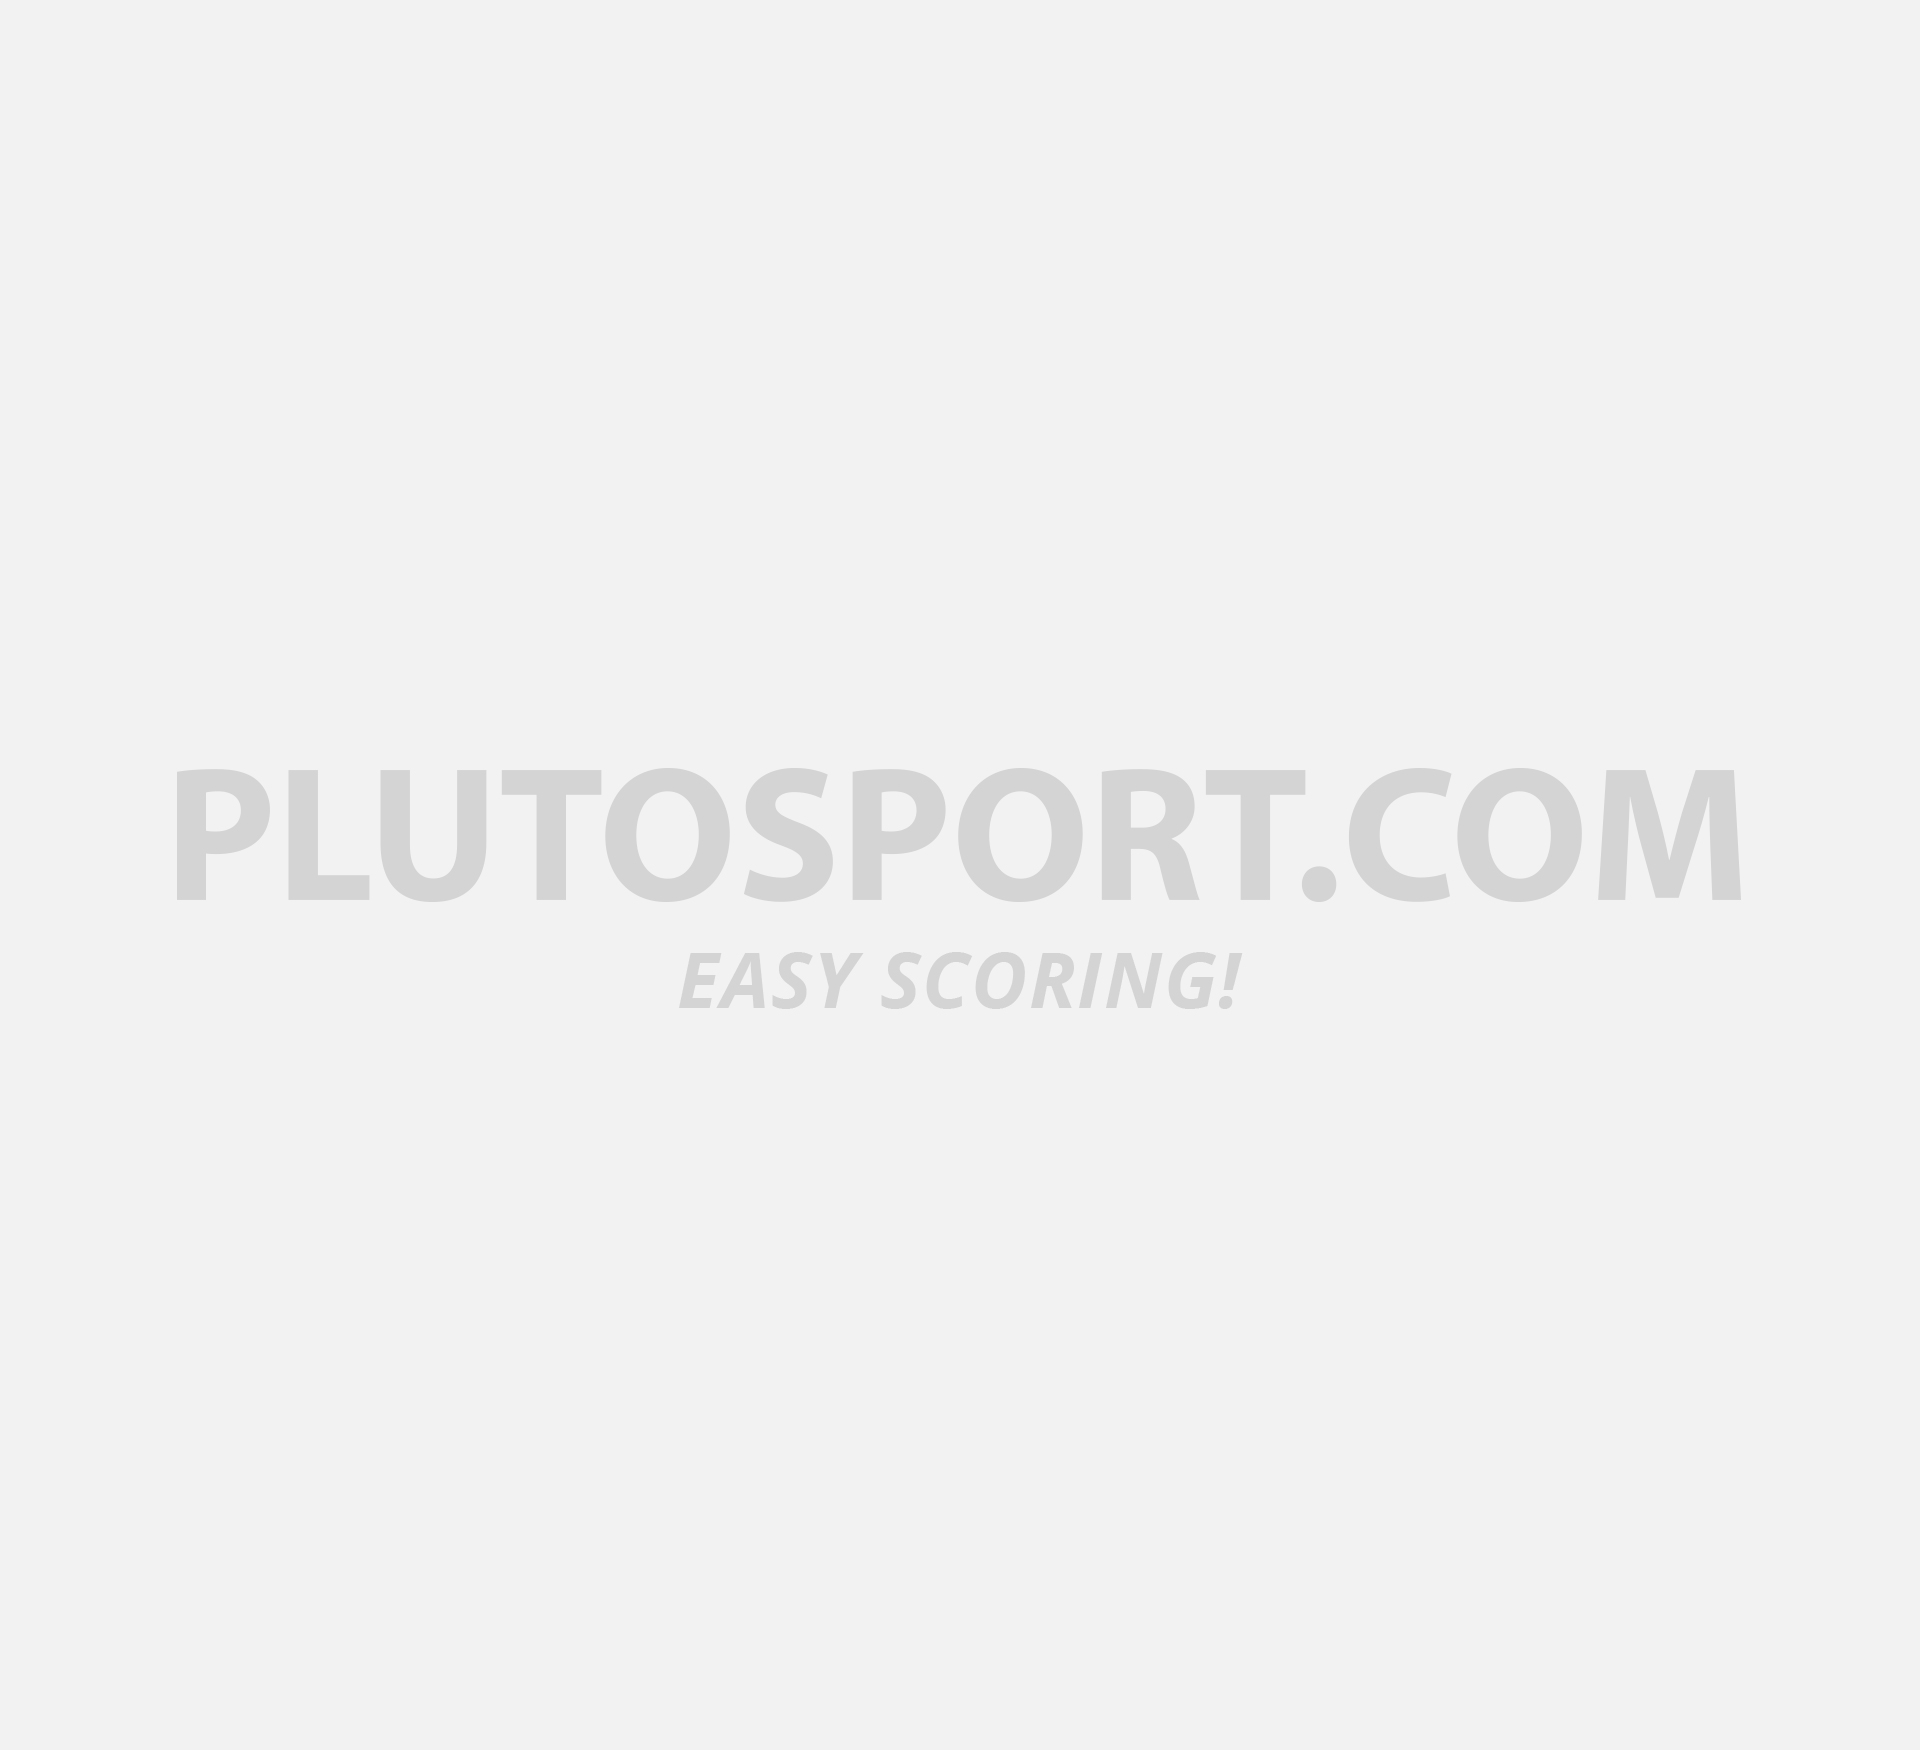 5cb8129b9 Adidas Referee 18 LS Jersey - Clothing - Referees - Football - Sports |  Plutosport